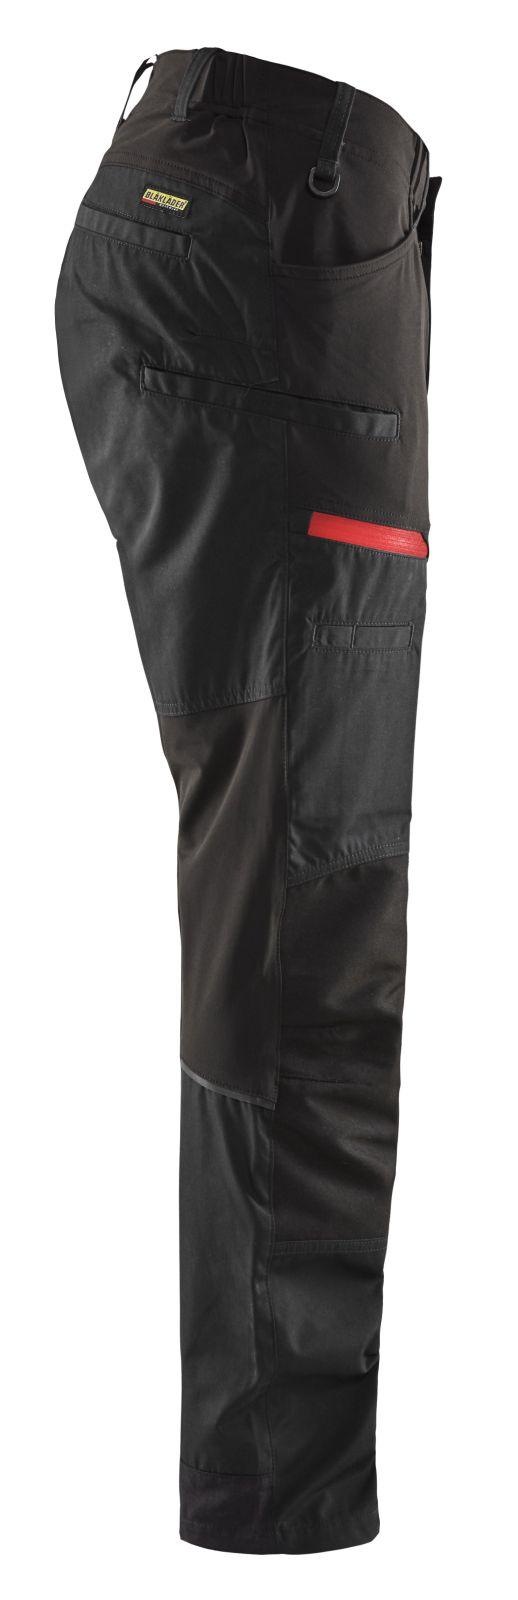 Blaklader Werkbroeken 14561845 met Stretch zwart-rood(9956)